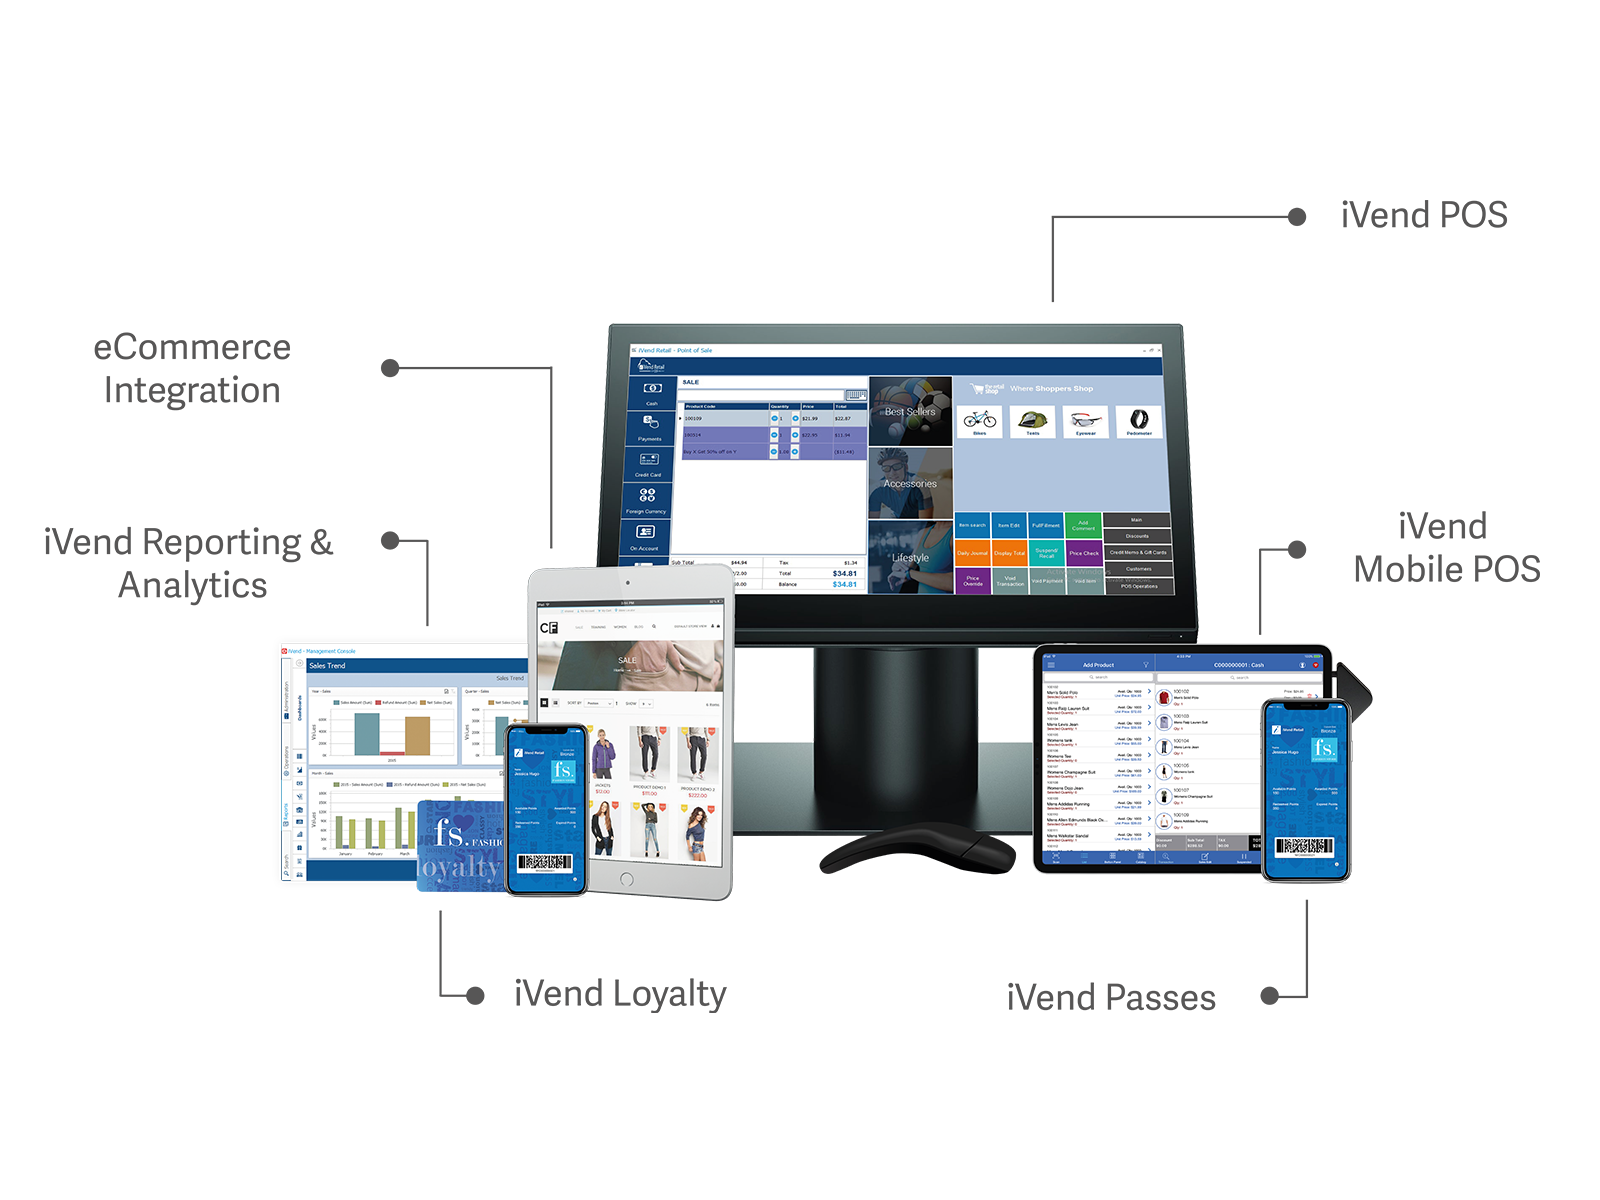 iVend Retail - An Omnichannel Platform